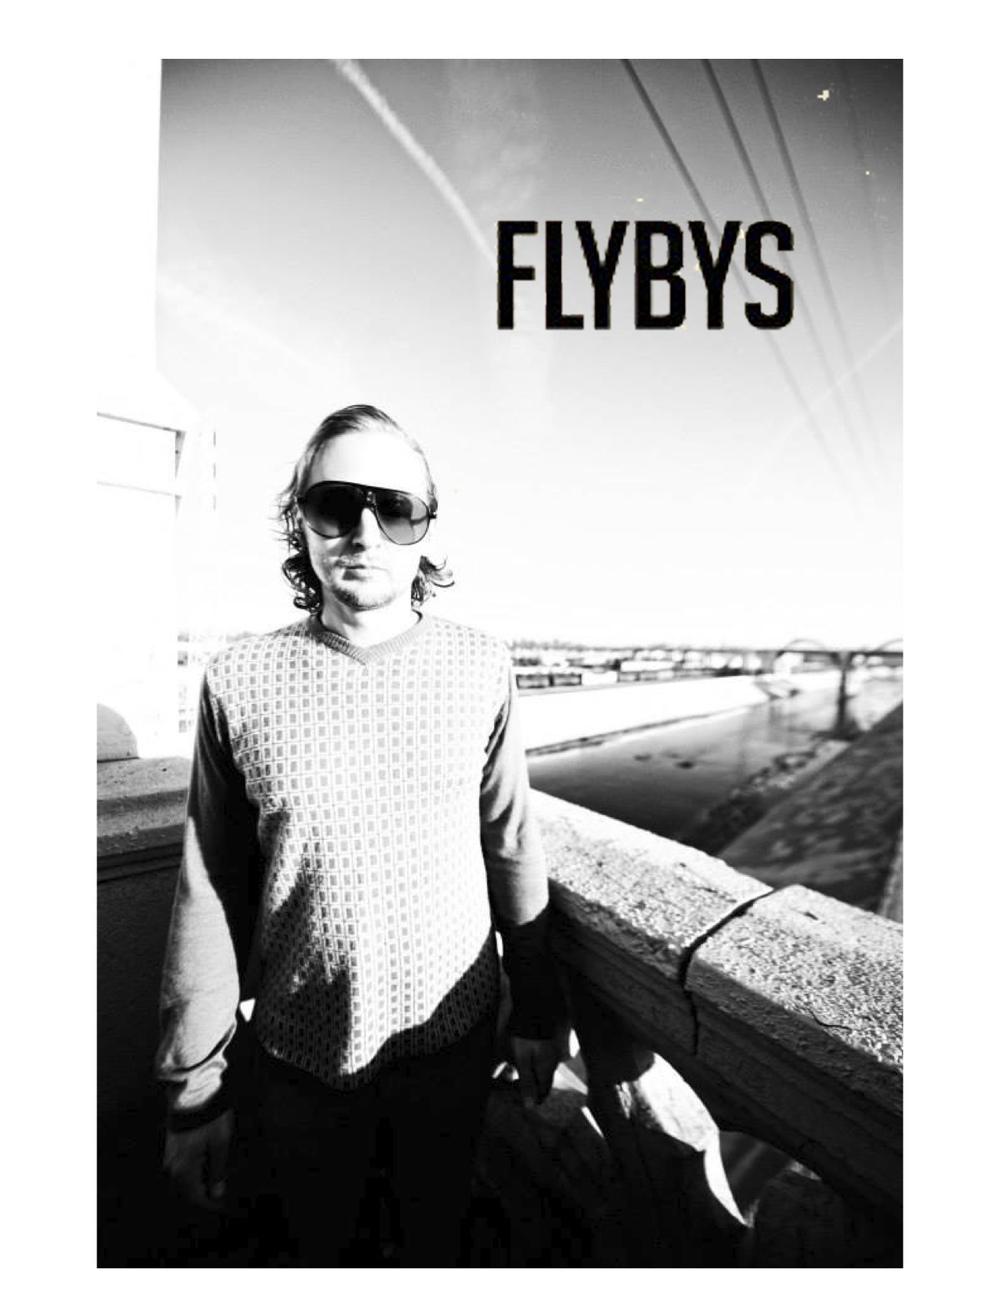 FLYBYS_22 copy.jpg